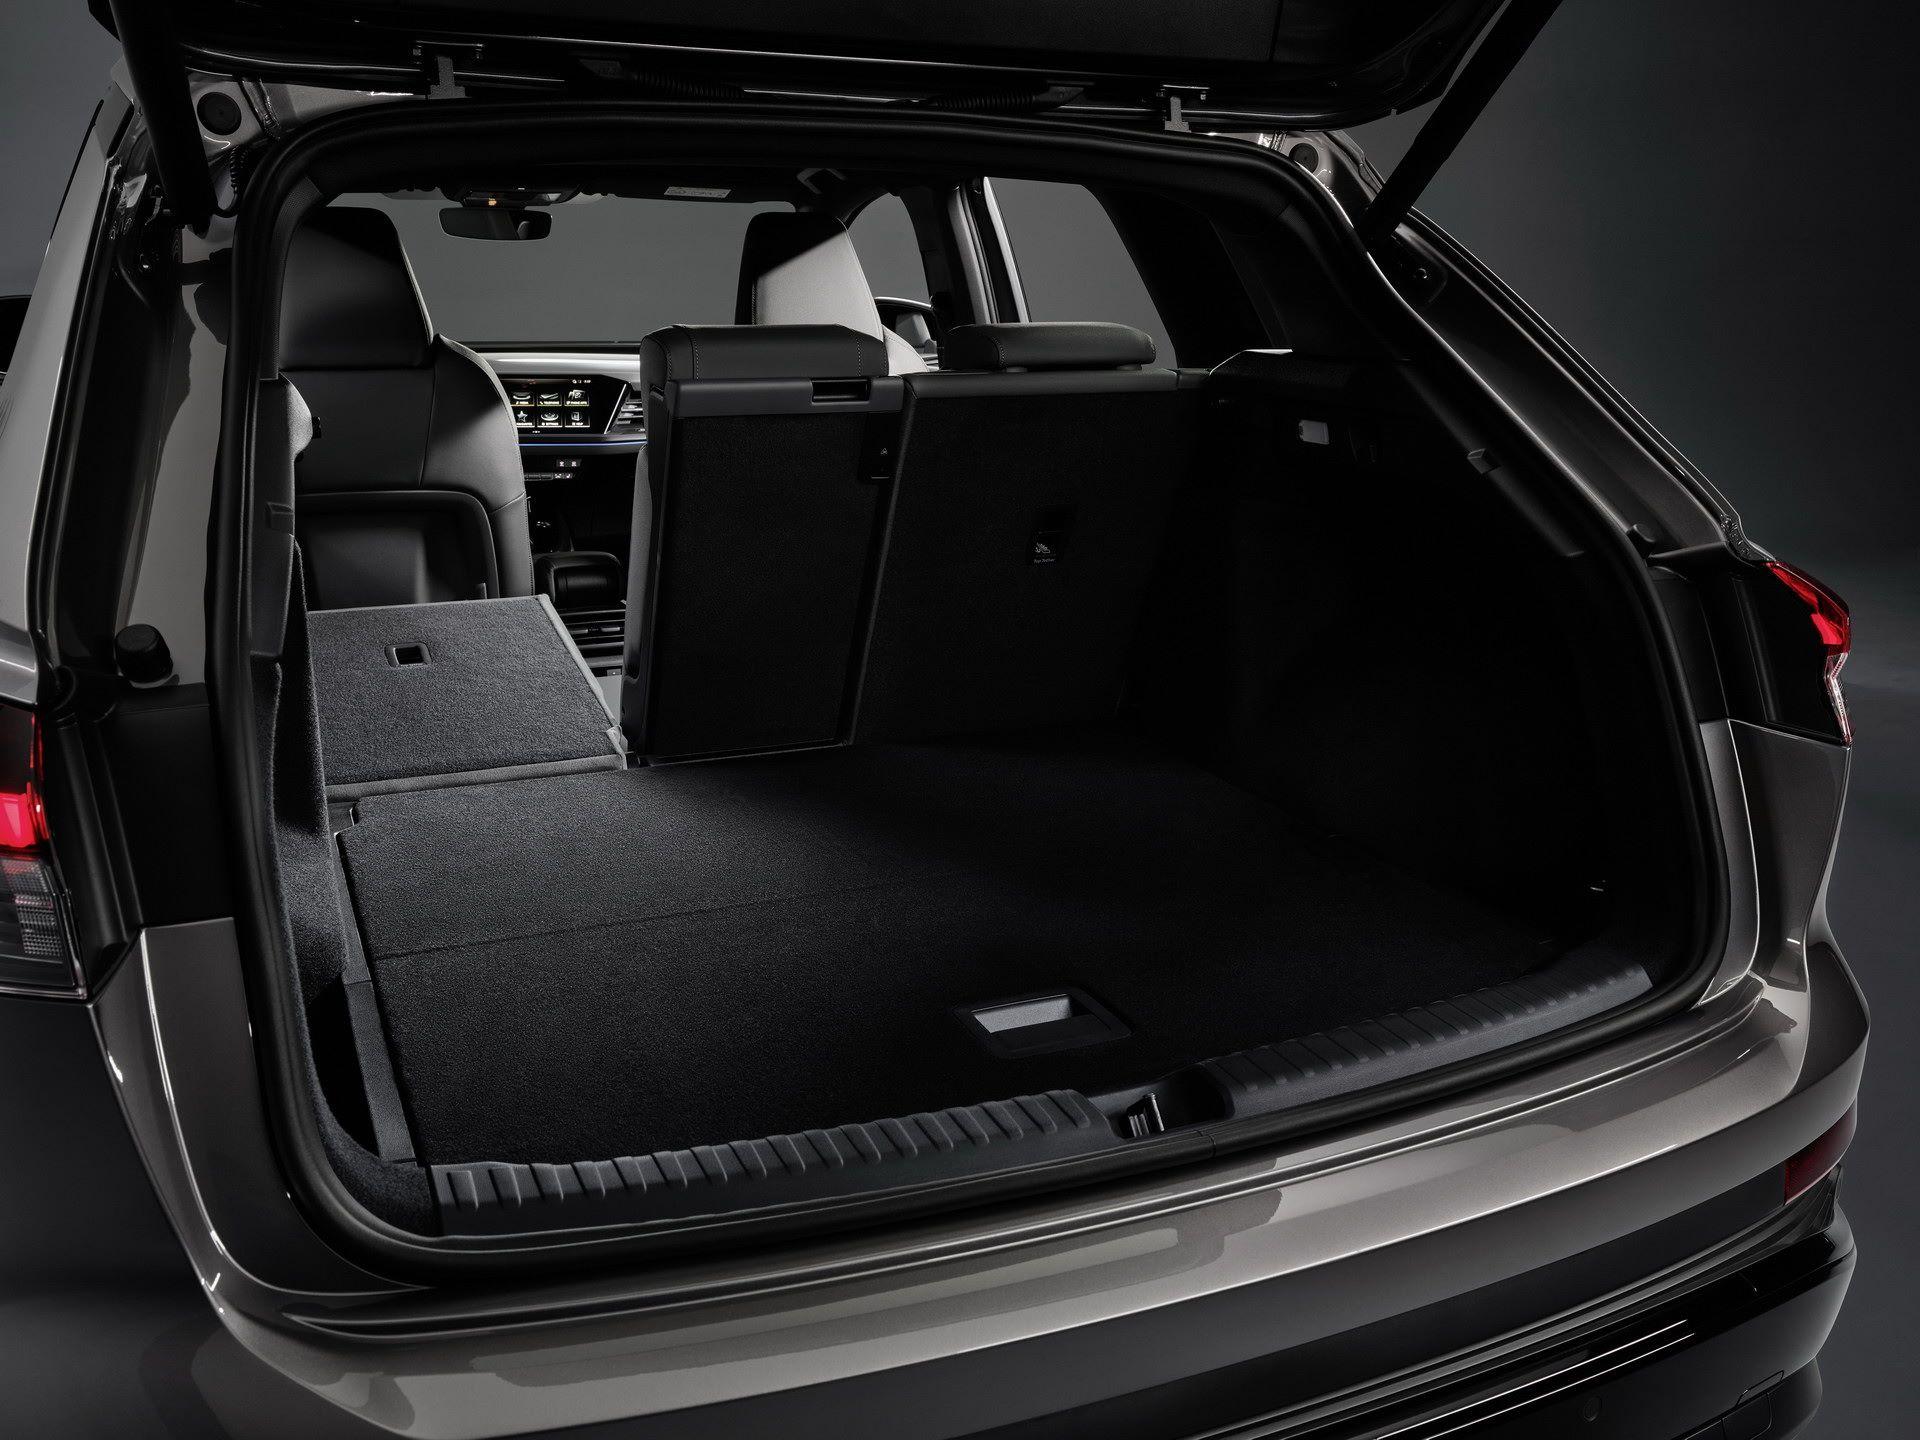 Audi-Q4-e-tron-and-Q4-e-tron-Sportback-81